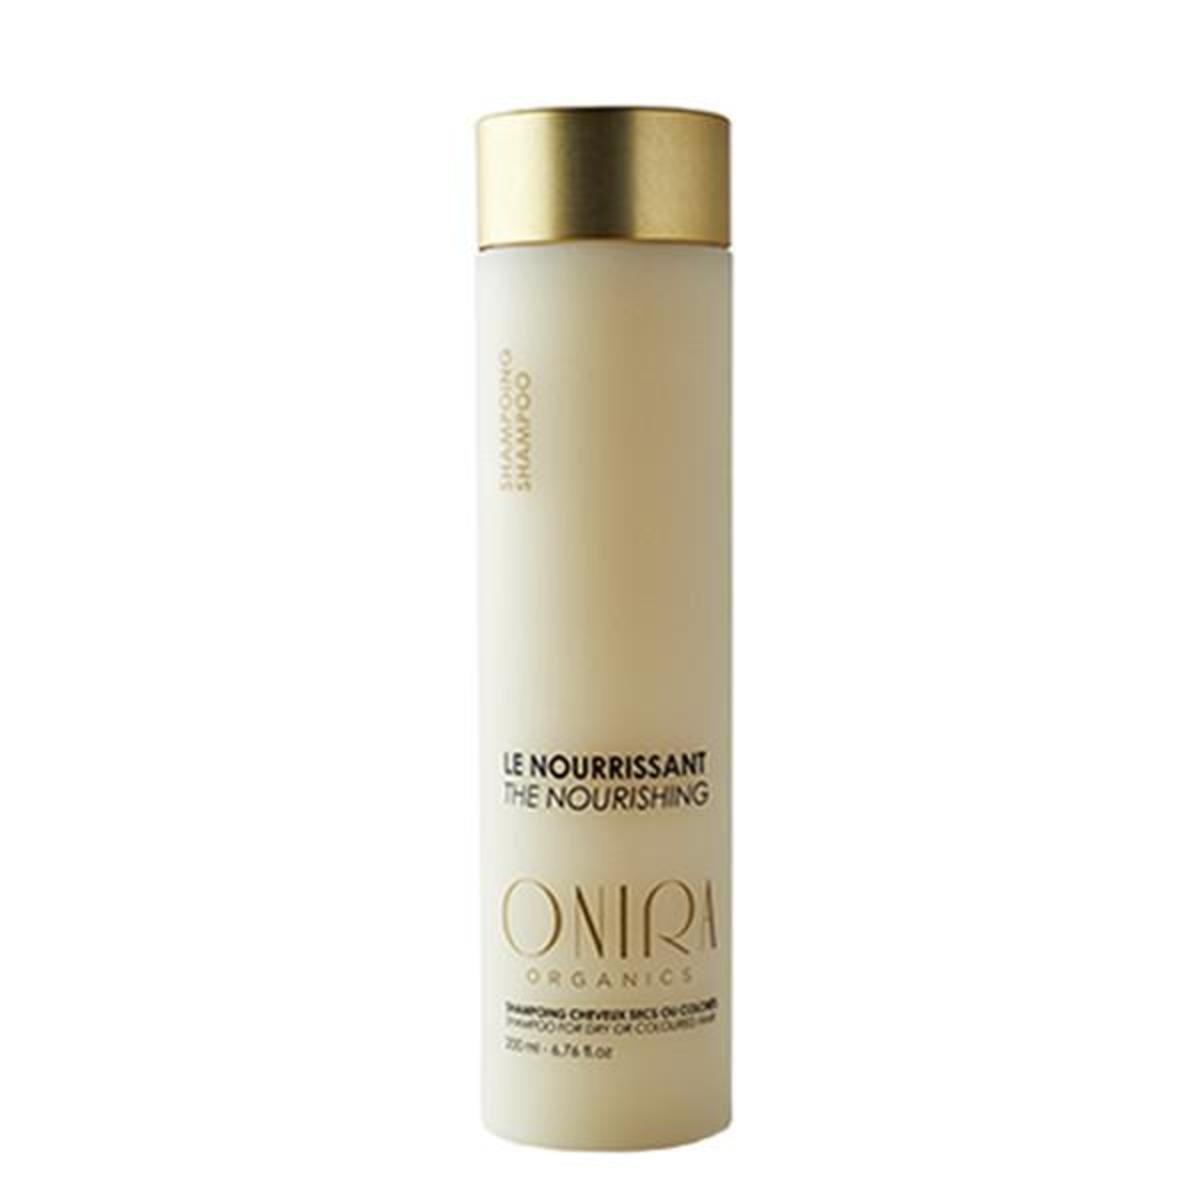 Onira Organics The Nourishing Shampoo